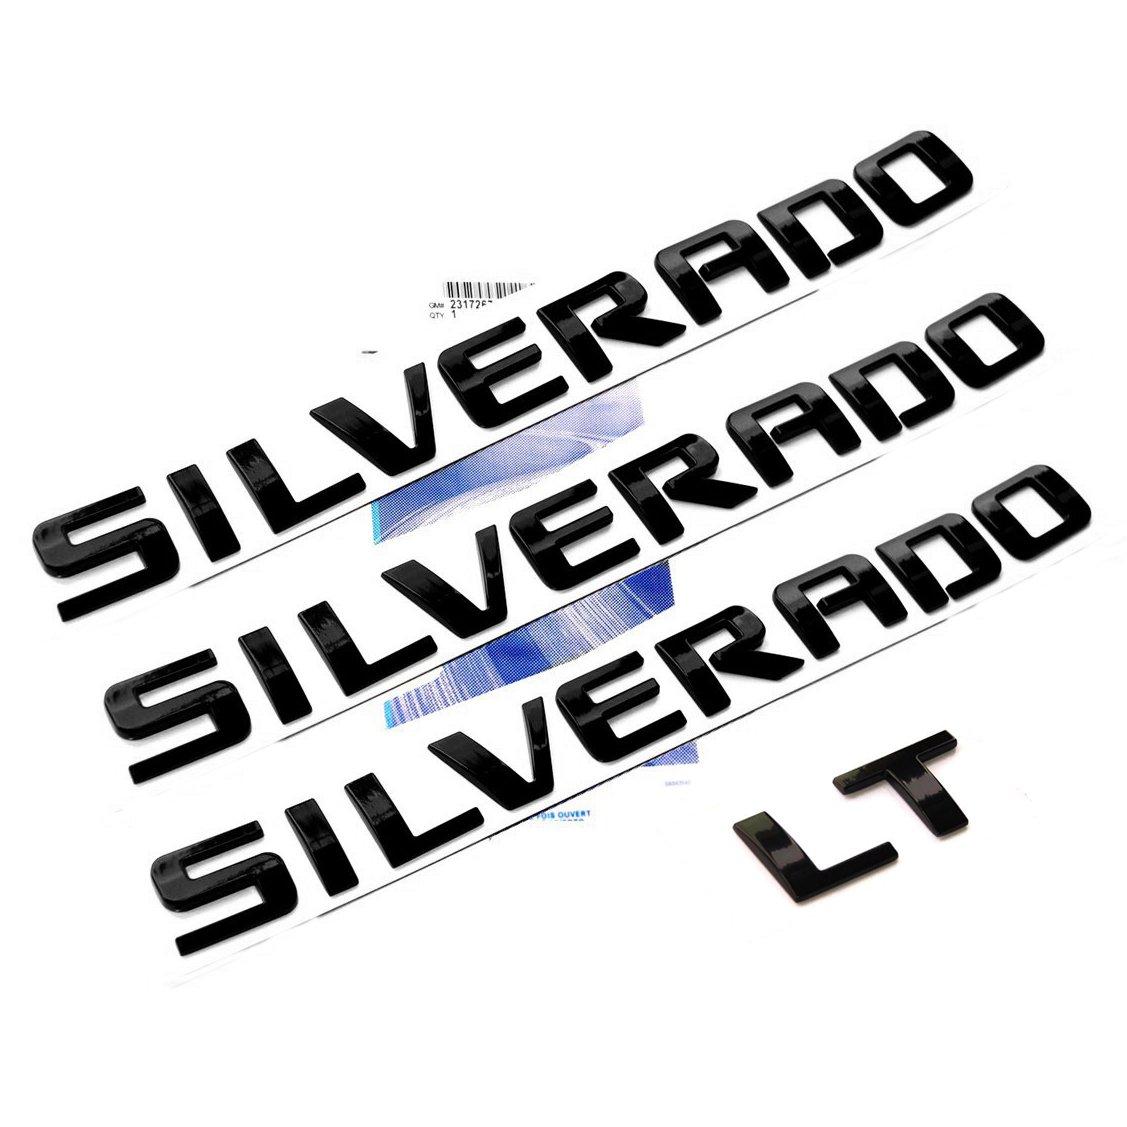 Yoaoo 3x OEM Black Silverado Plus Lt Nameplate Letter Emblems 3D Badge for Silverado 1500 2500Hd 3500Hd Original Silverado Glossy Black